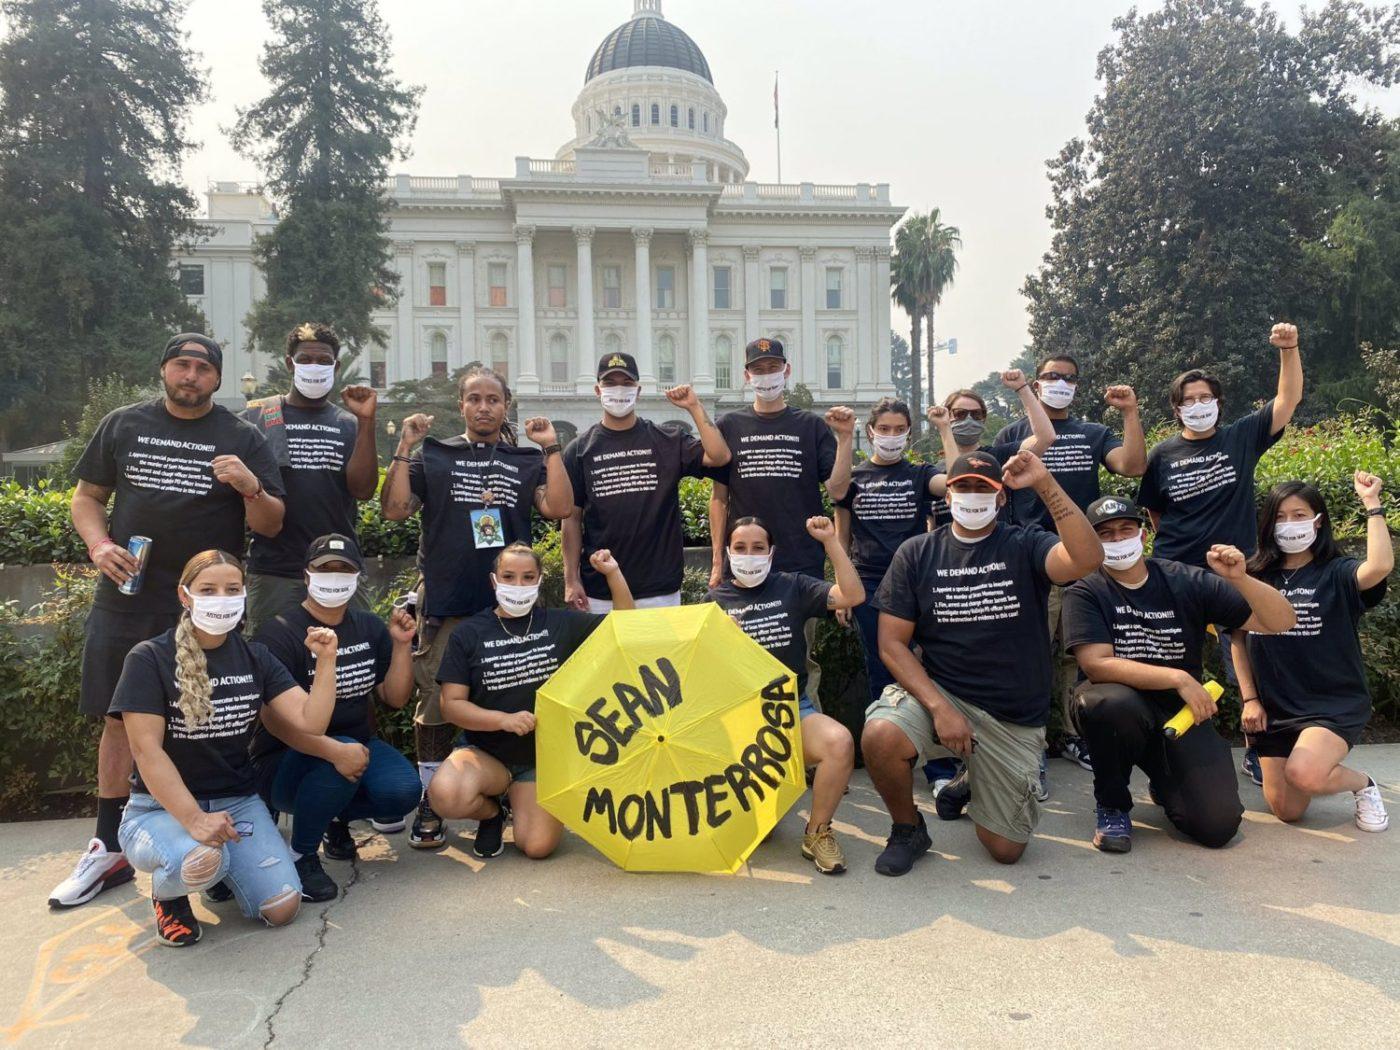 Action-in-Sacramento-Sean-Monterrosa_1020-1-1400x1050, Open letter to Gov. Newsom: Hold police accountable and investigate the Vallejo police killing of Sean Monterrosa, Local News & Views